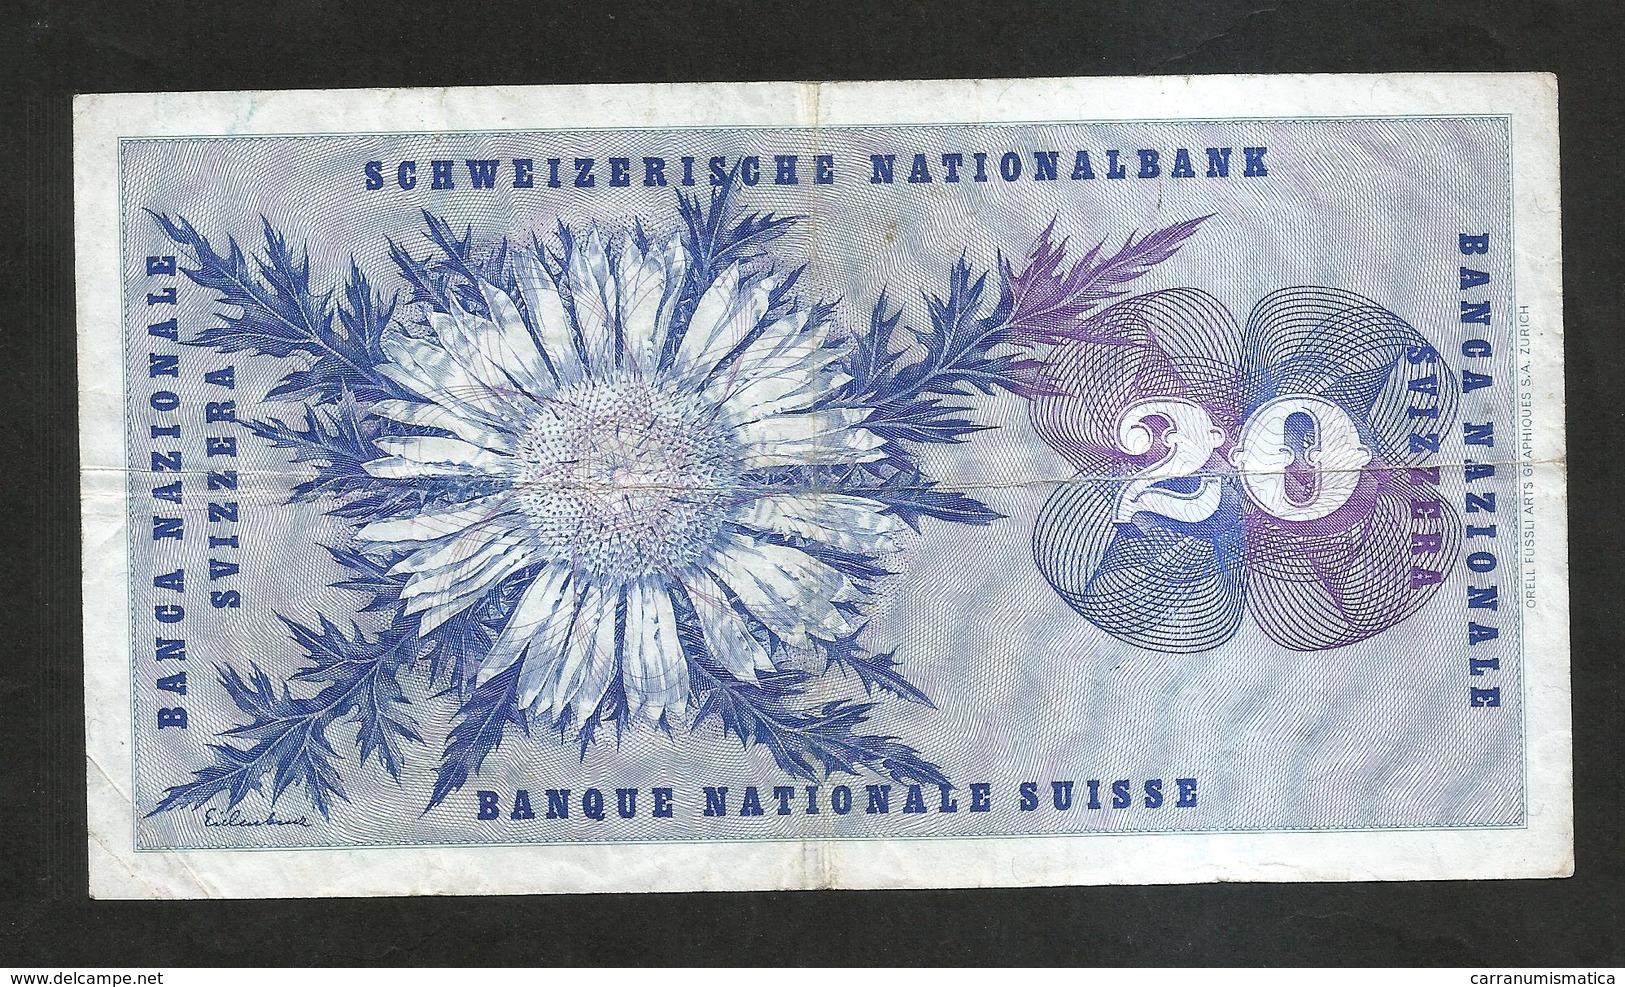 SVIZZERA / SUISSE / SWITZERLAND - NATIONAL BANK - 20 FRANCS / FRANKEN (1971)  H. DUFOUR - Svizzera